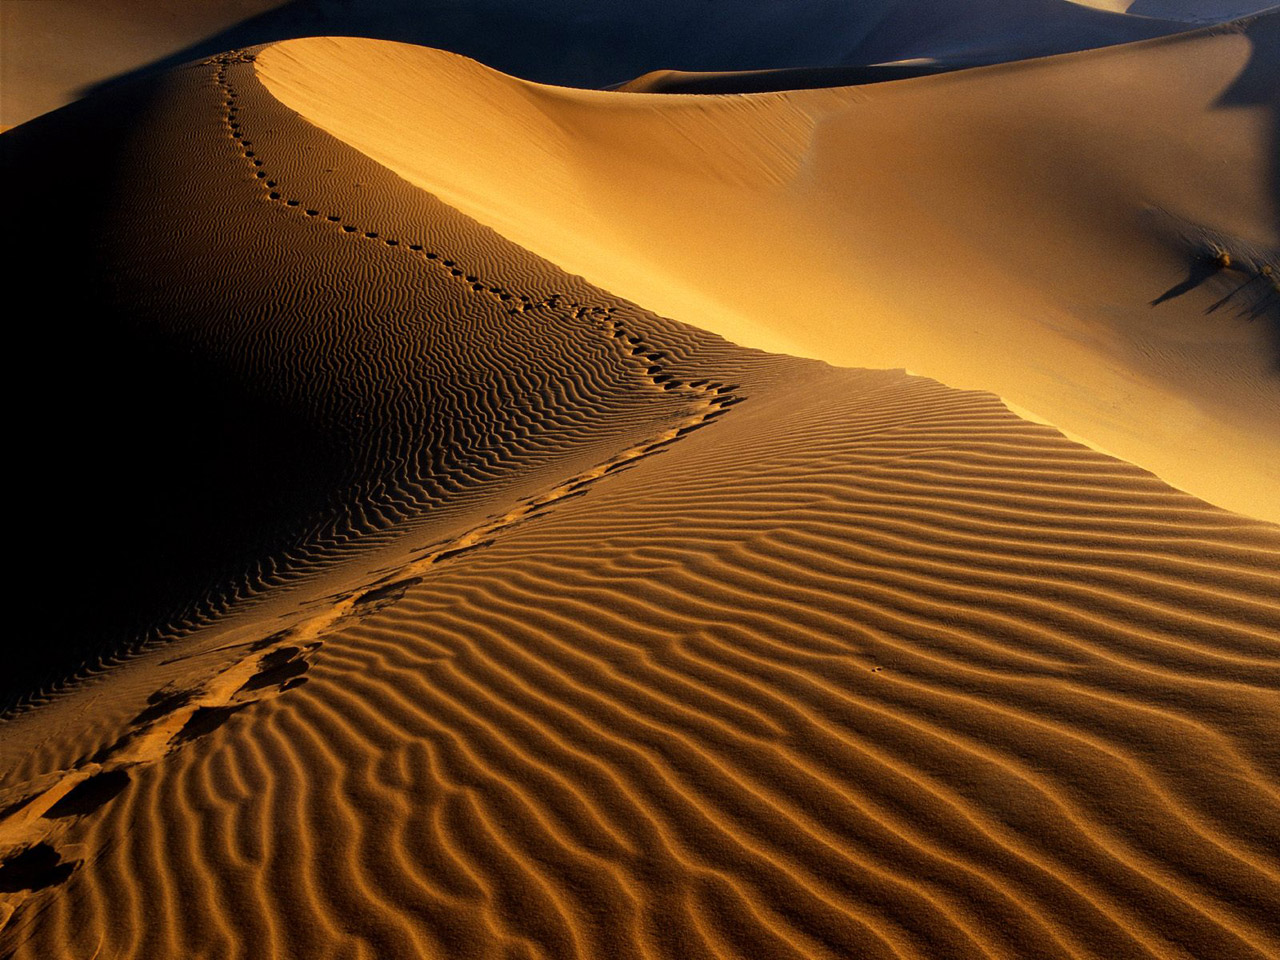 C:\Documents and Settings\Admin\Мои документы\Мои рисунки\desert_2.jpg